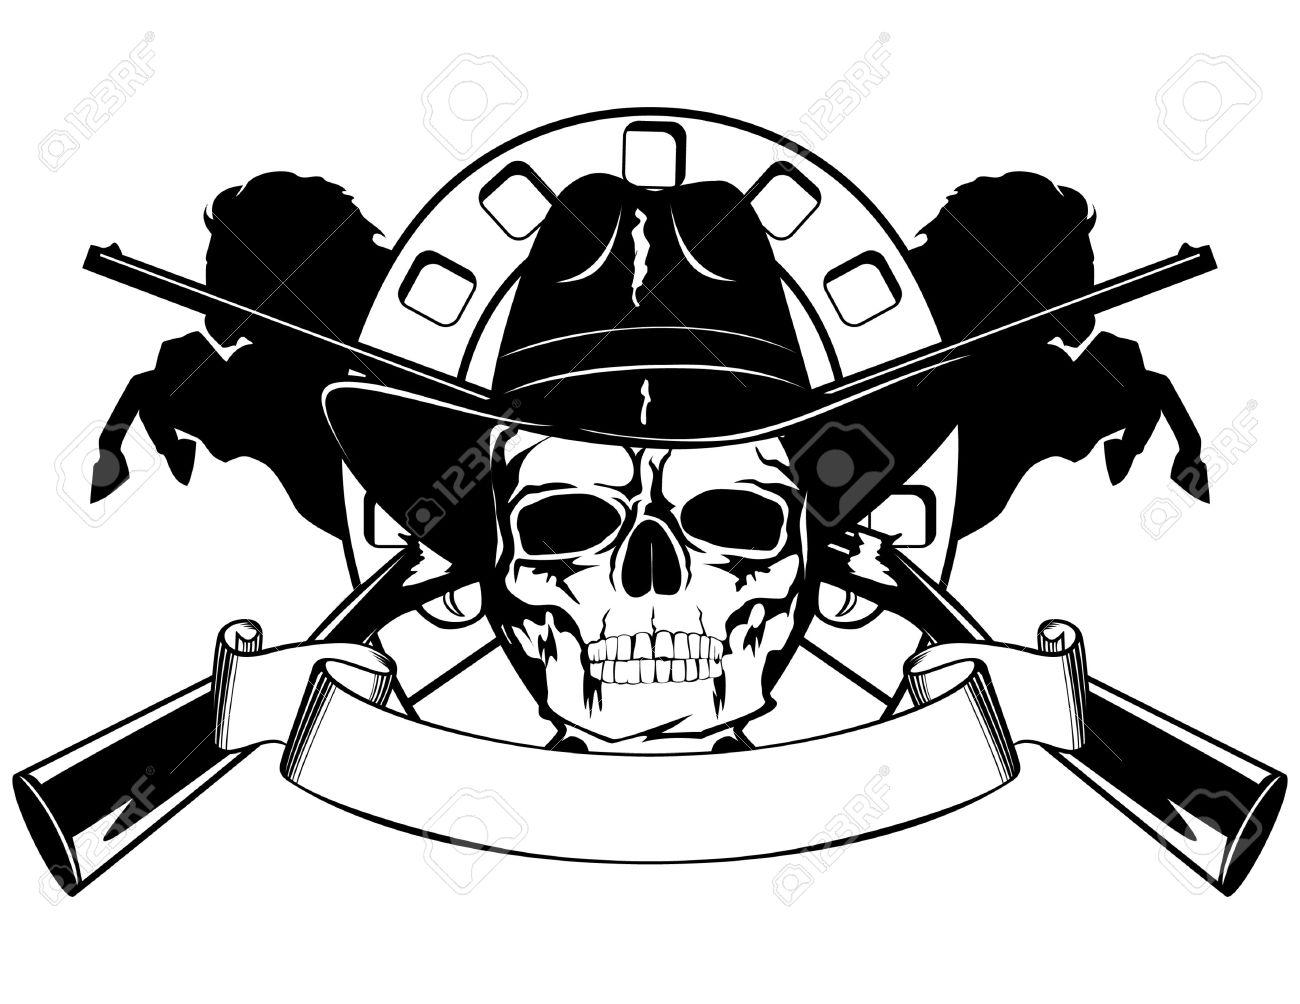 Gun Tattoo Drawings